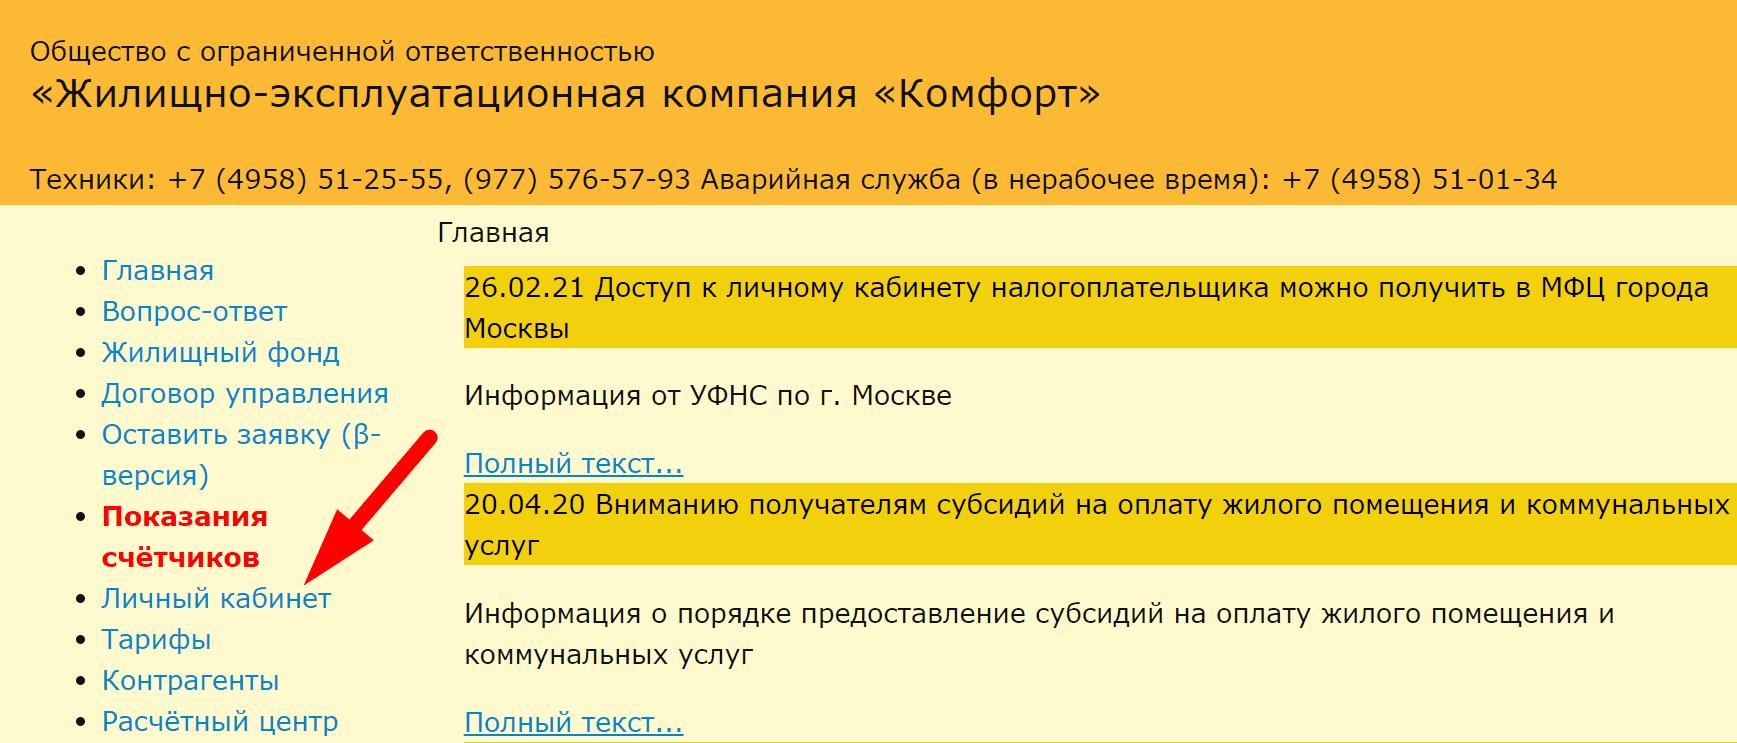 Ссылка на сайт компании «Комфорт»